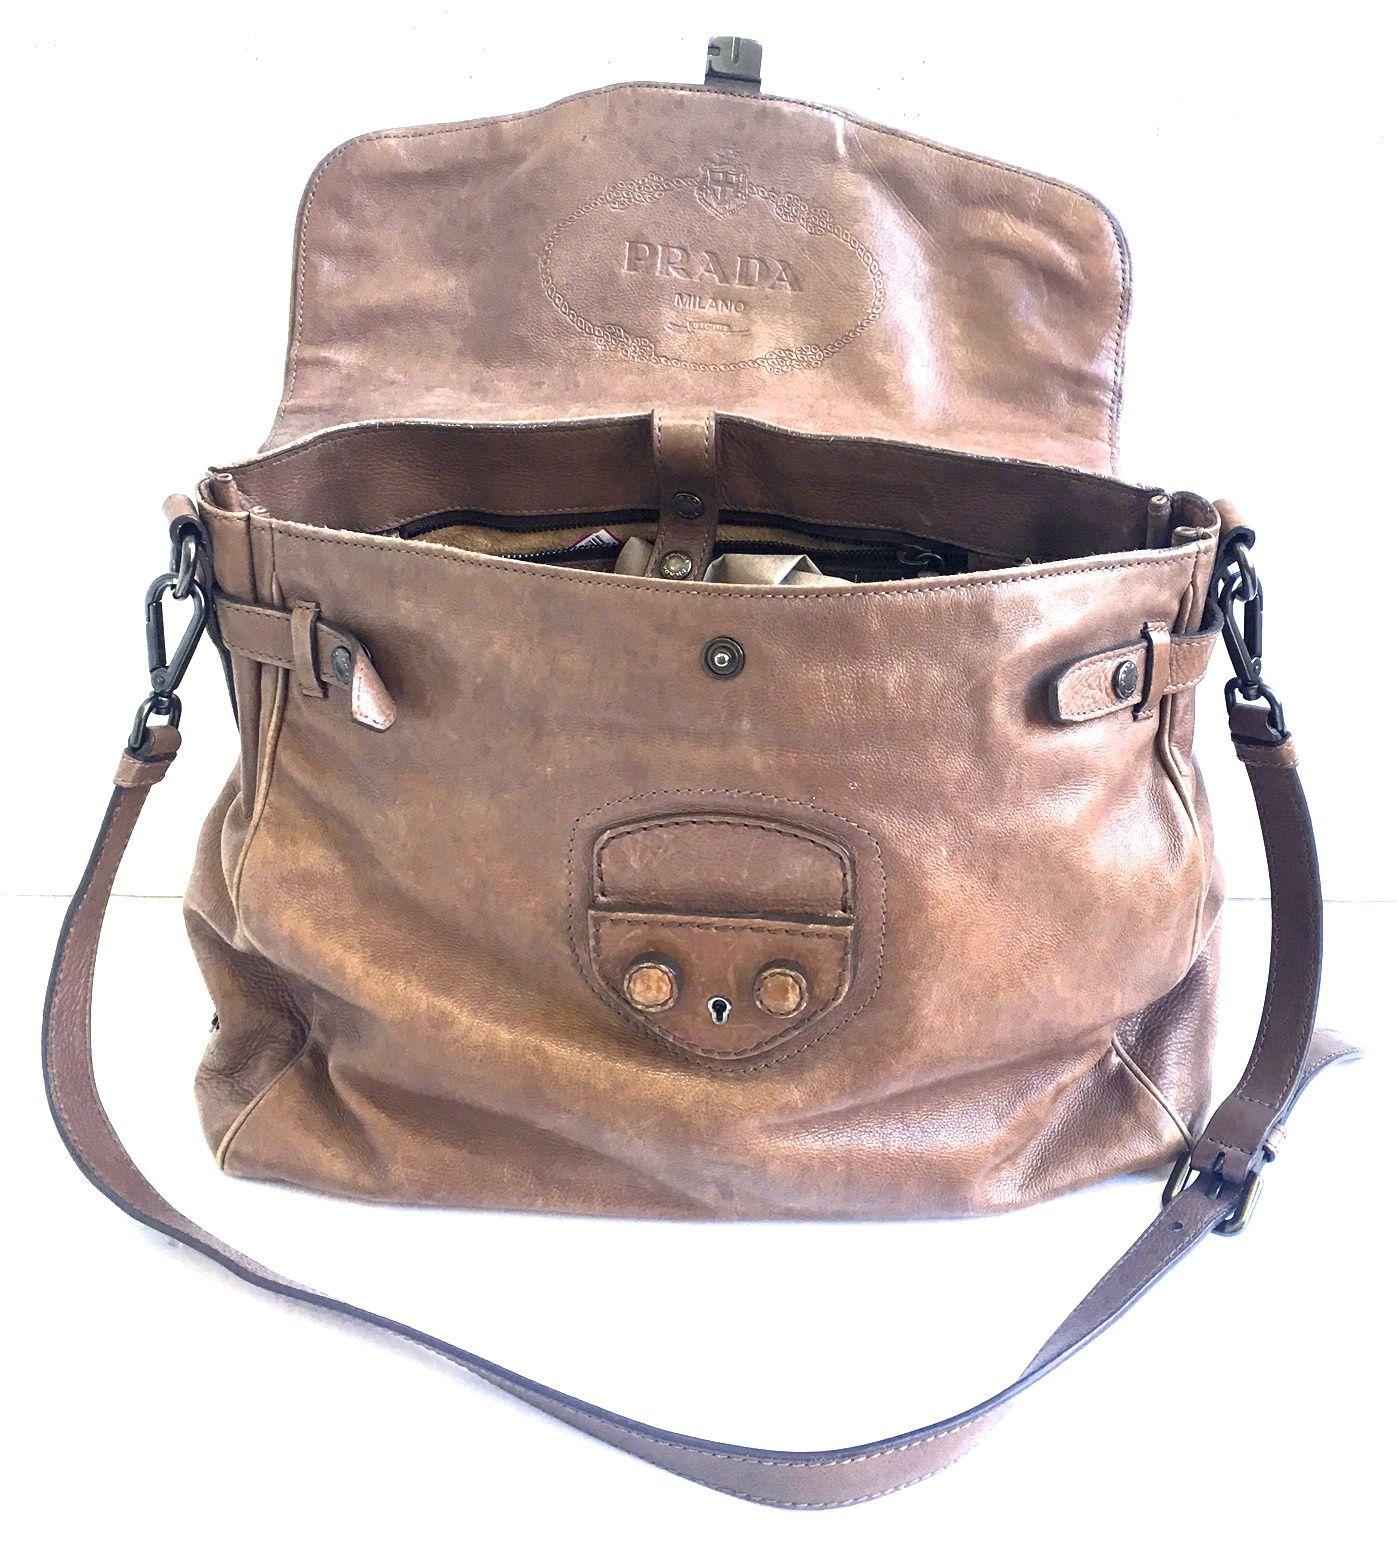 43ef204194f5 AUTH Pre-Owned PRADA Leather Unisex Messenger Handbag OUR PRICE -    750.00  Retail Price   2